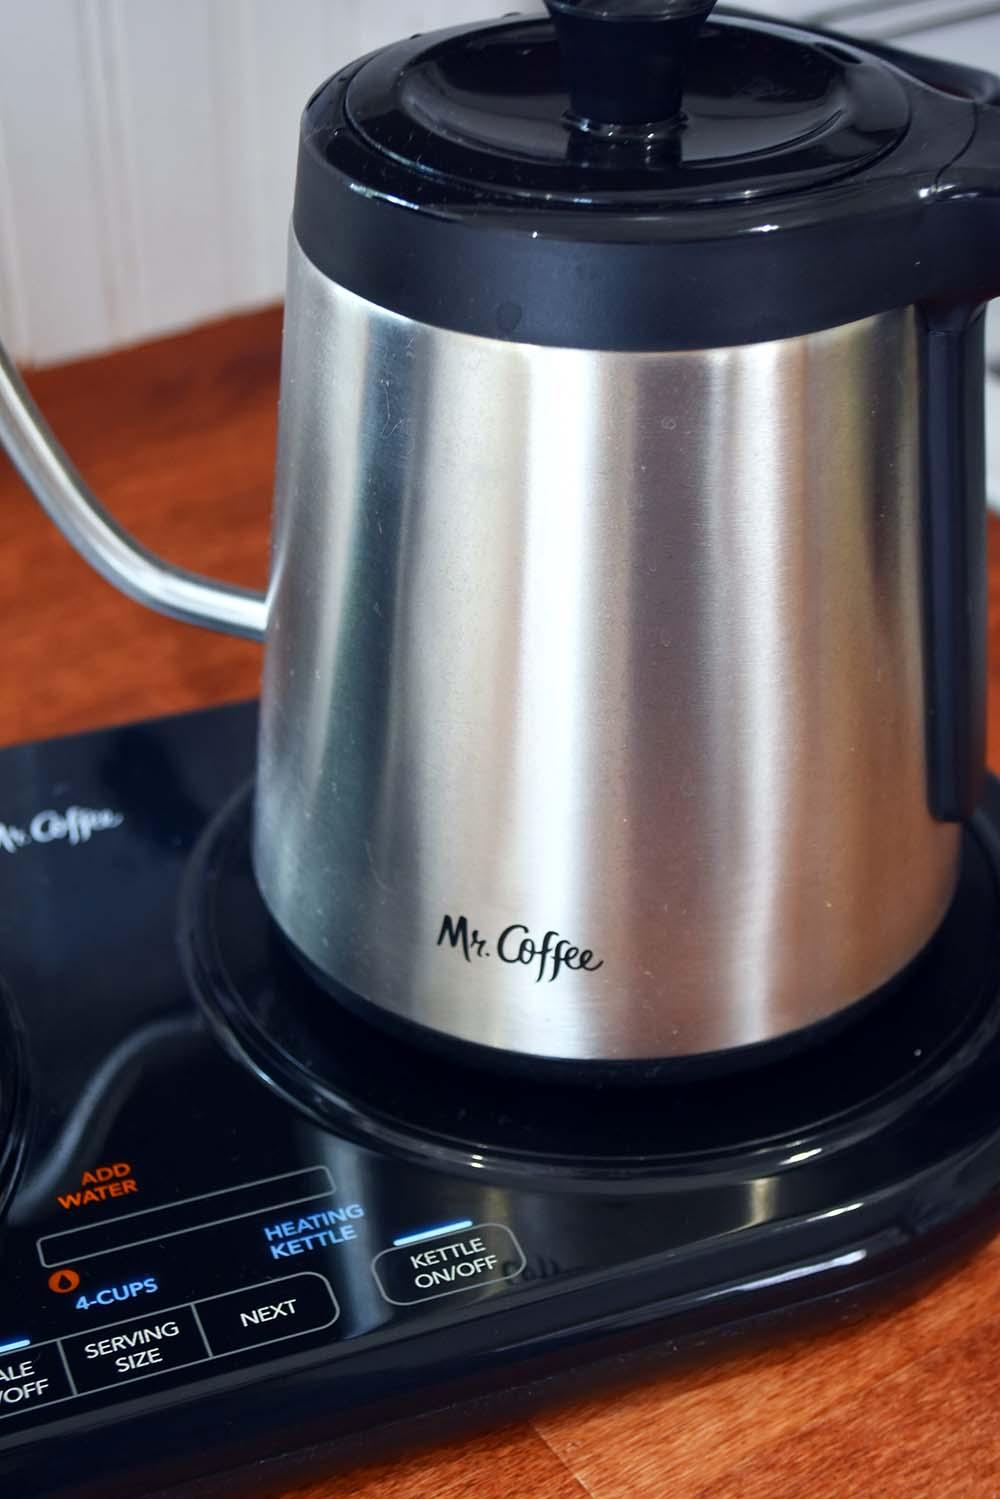 Mr.Coffee Electric tea kettle